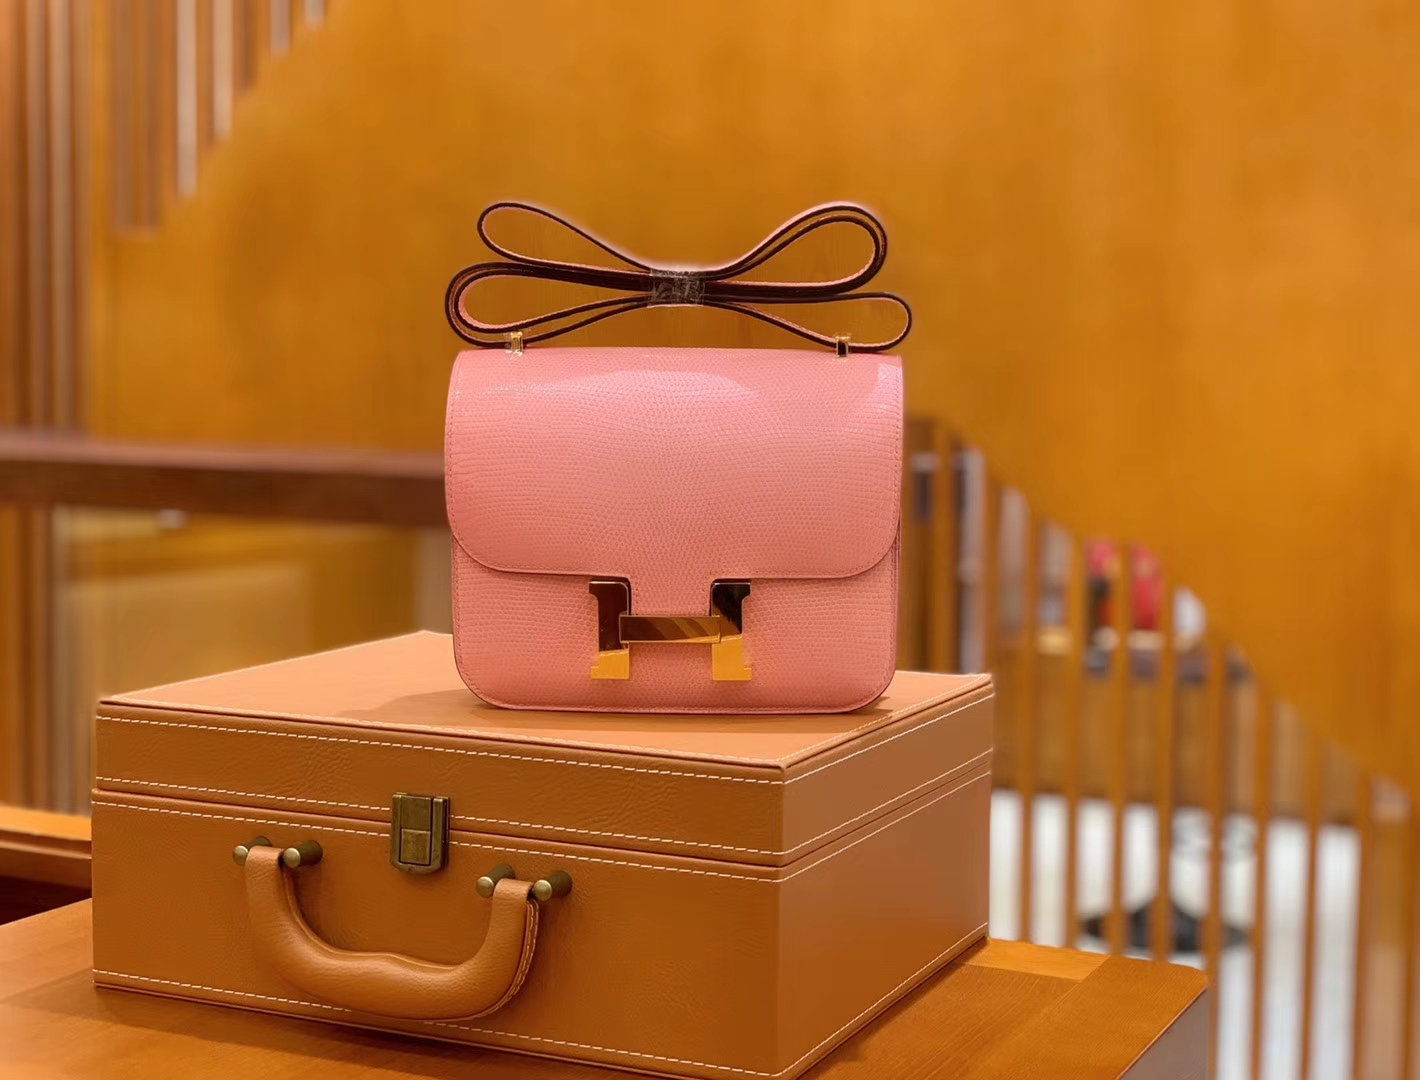 Hermès(爱马仕)Constance 空姐包 樱花粉 野生蜥蜴皮 全手工缝制 18cm 金扣 现货